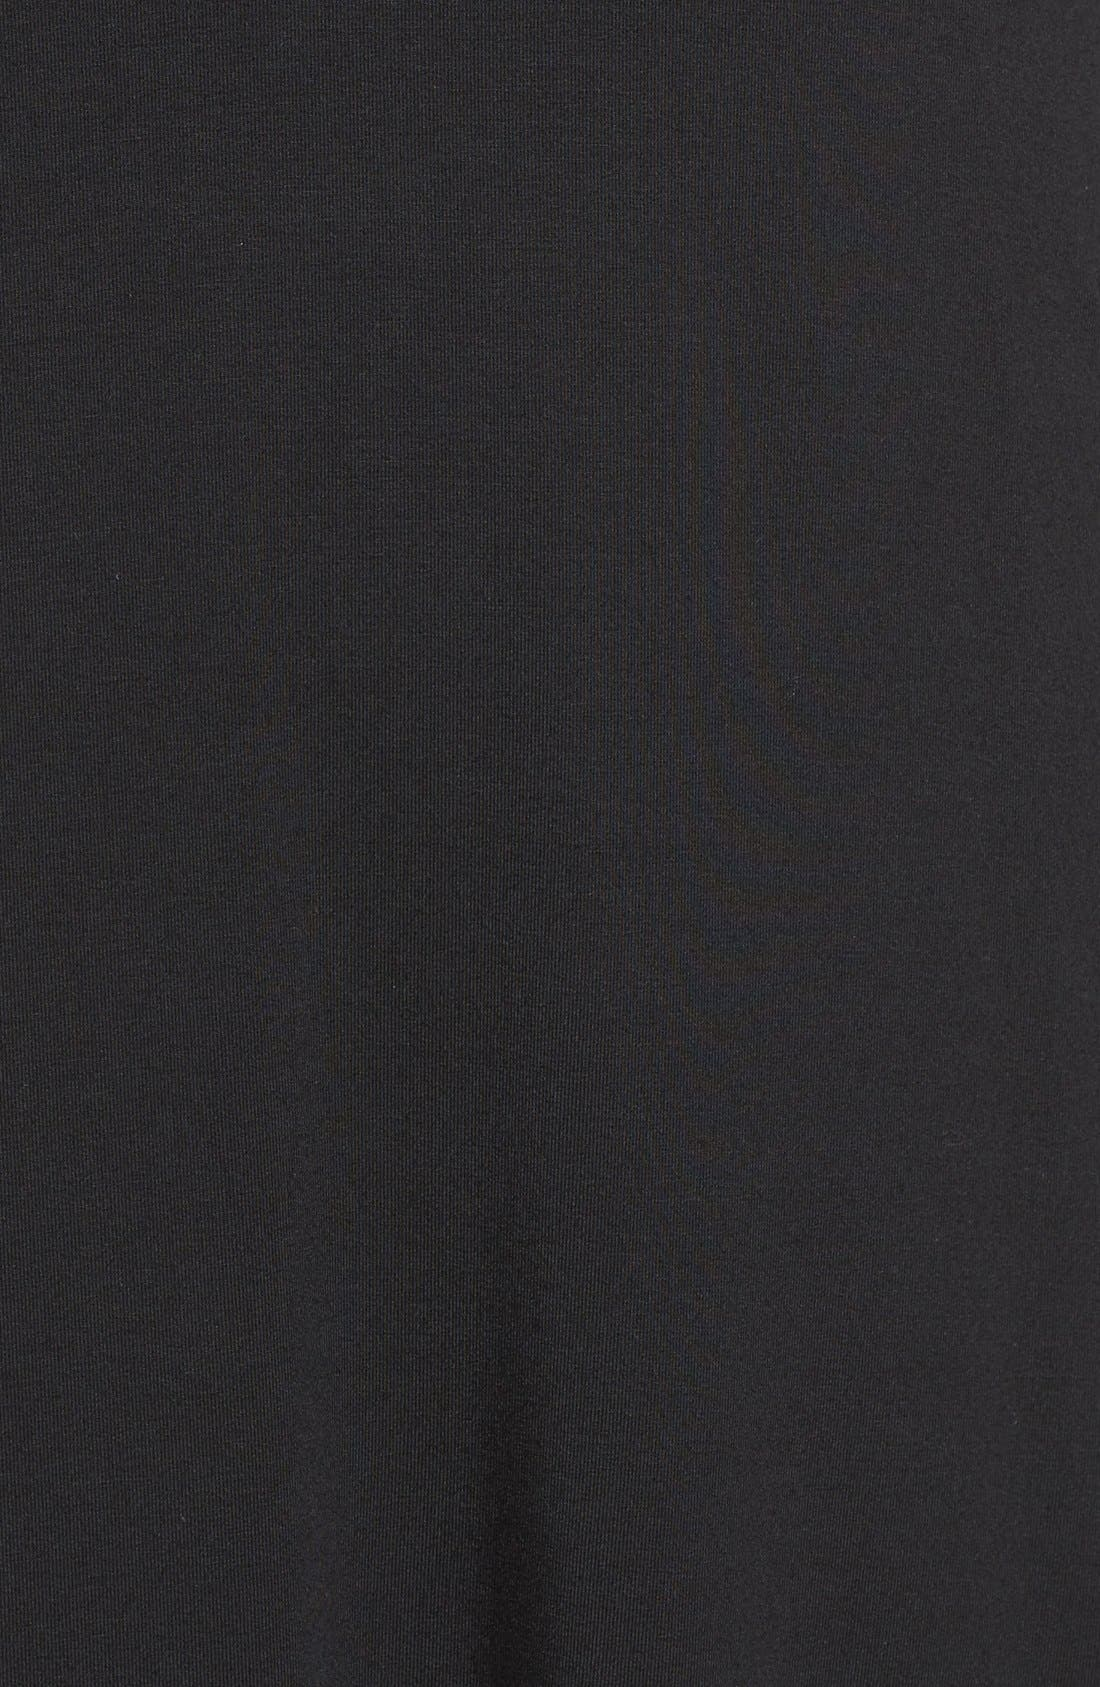 Sally Turtleneck A-Line Dress,                             Alternate thumbnail 5, color,                             Black